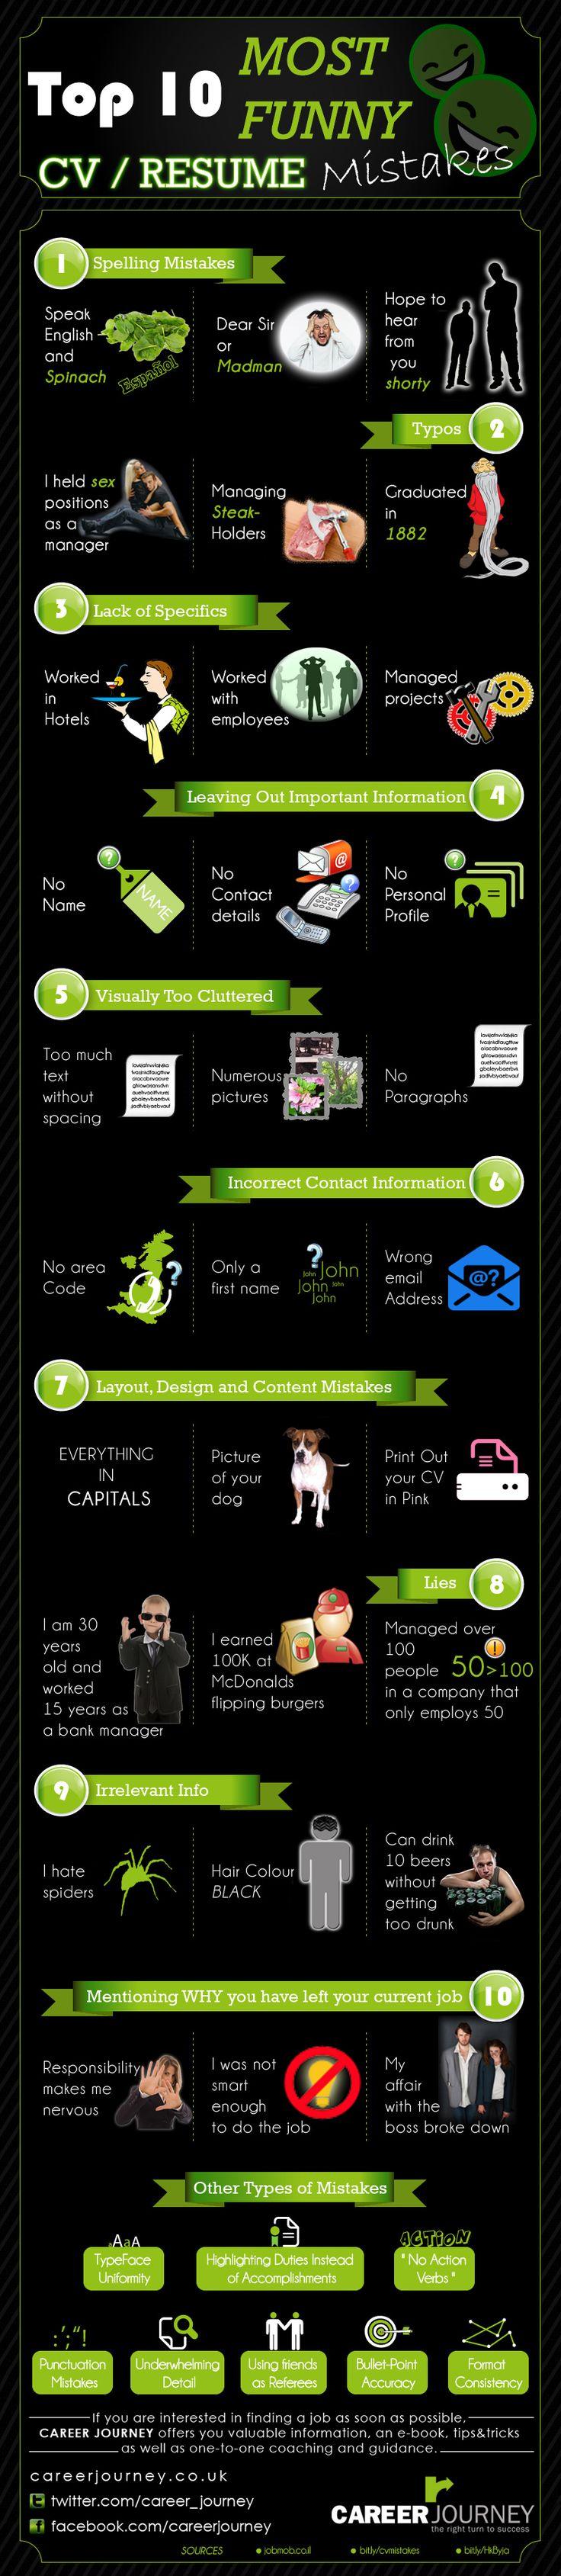 Top Ten Funniest Resume/CV Mistakes #resume #tips #careerhowtos #design  Agility Resources | Social Agility www.AgilityResourcesInc.com